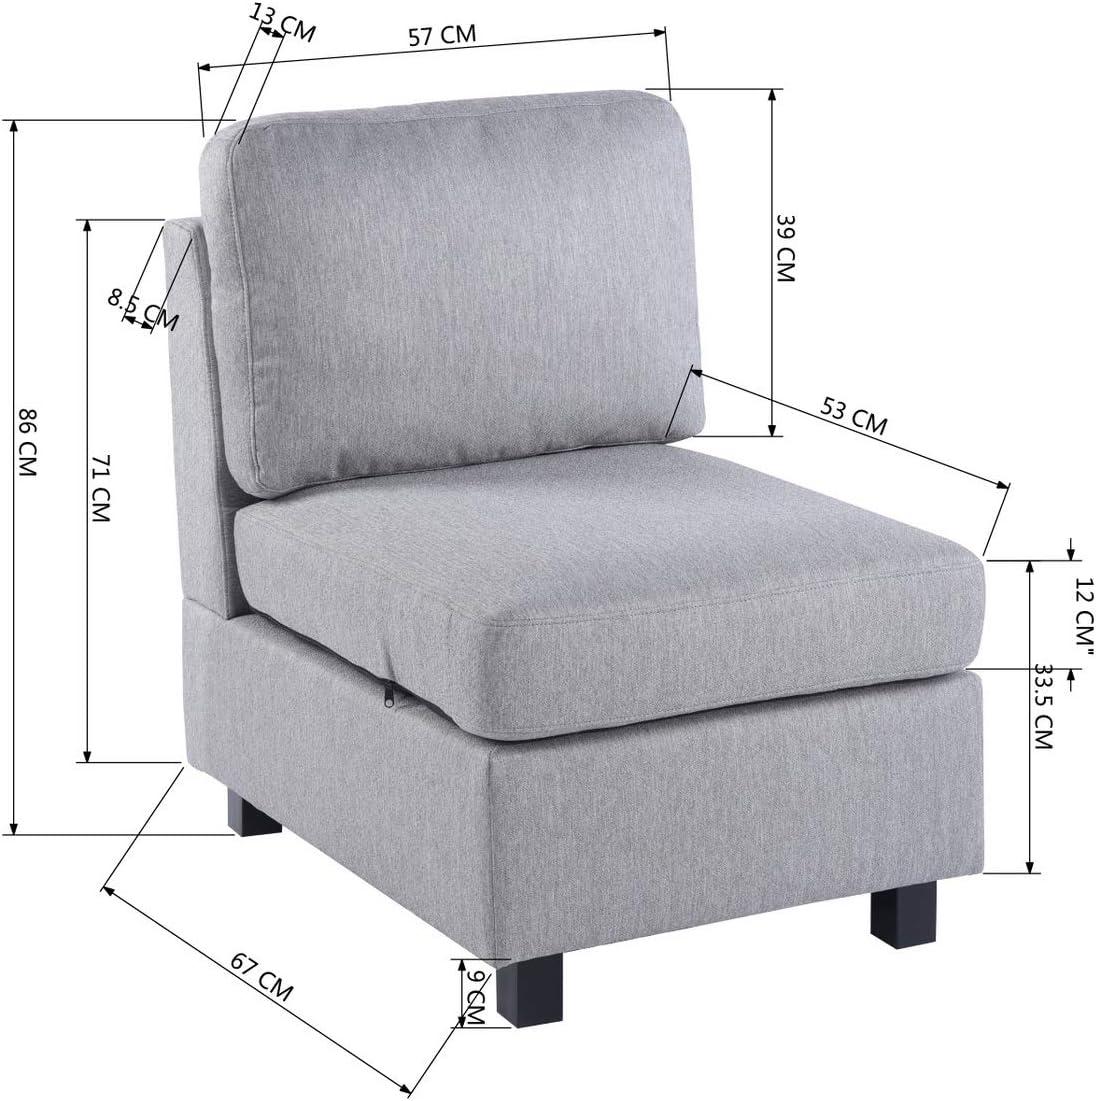 modulabile rimovibile Sedile modulare reversibile in tessuto grigio